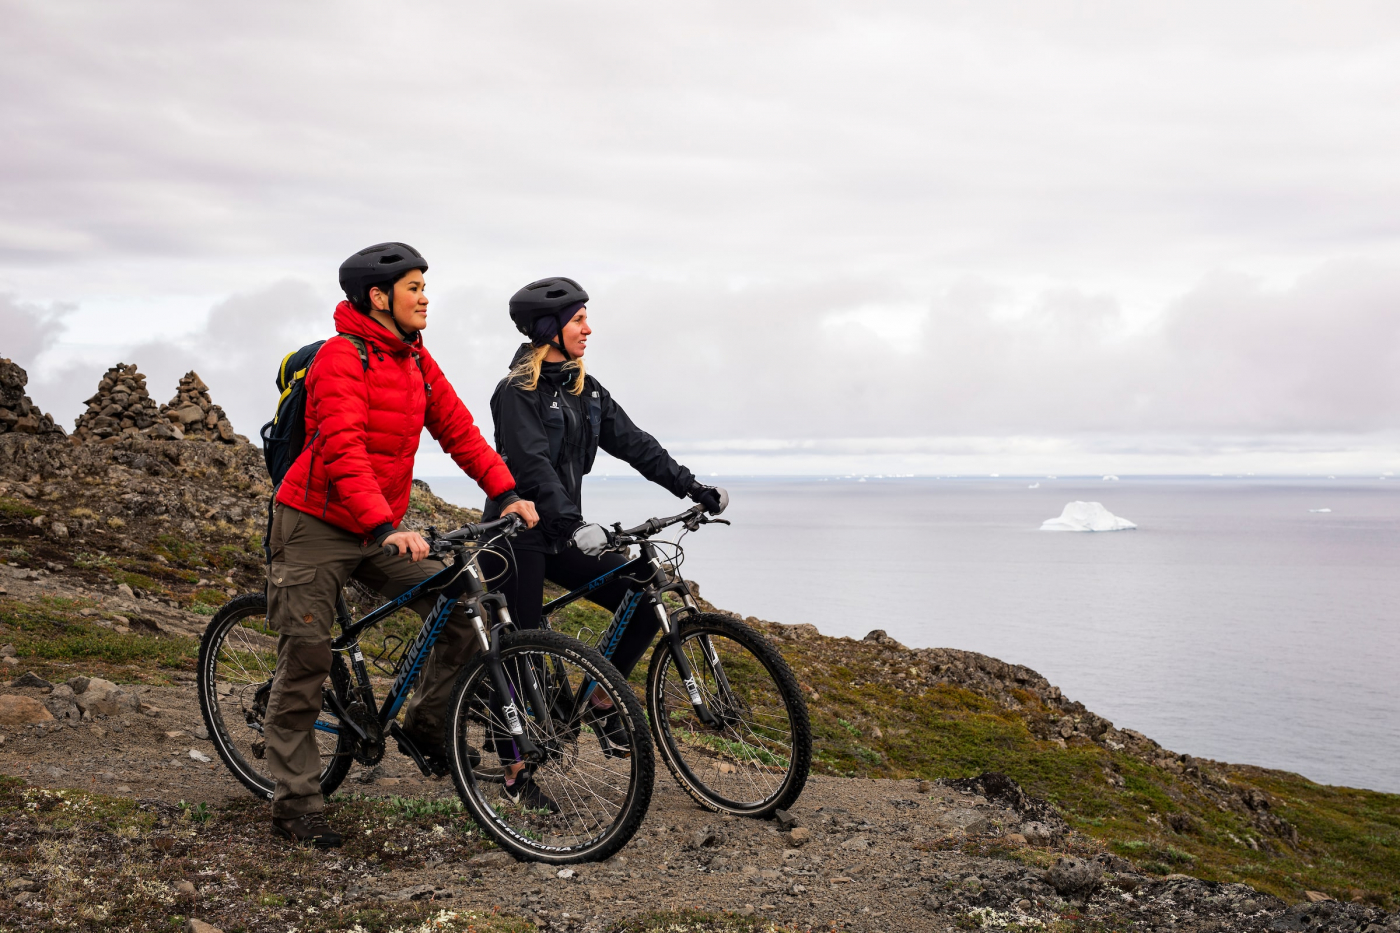 Mountain Bikers In Qeqertarsuaq. Aningaaq Rosing Carlsen - Visit Greenland